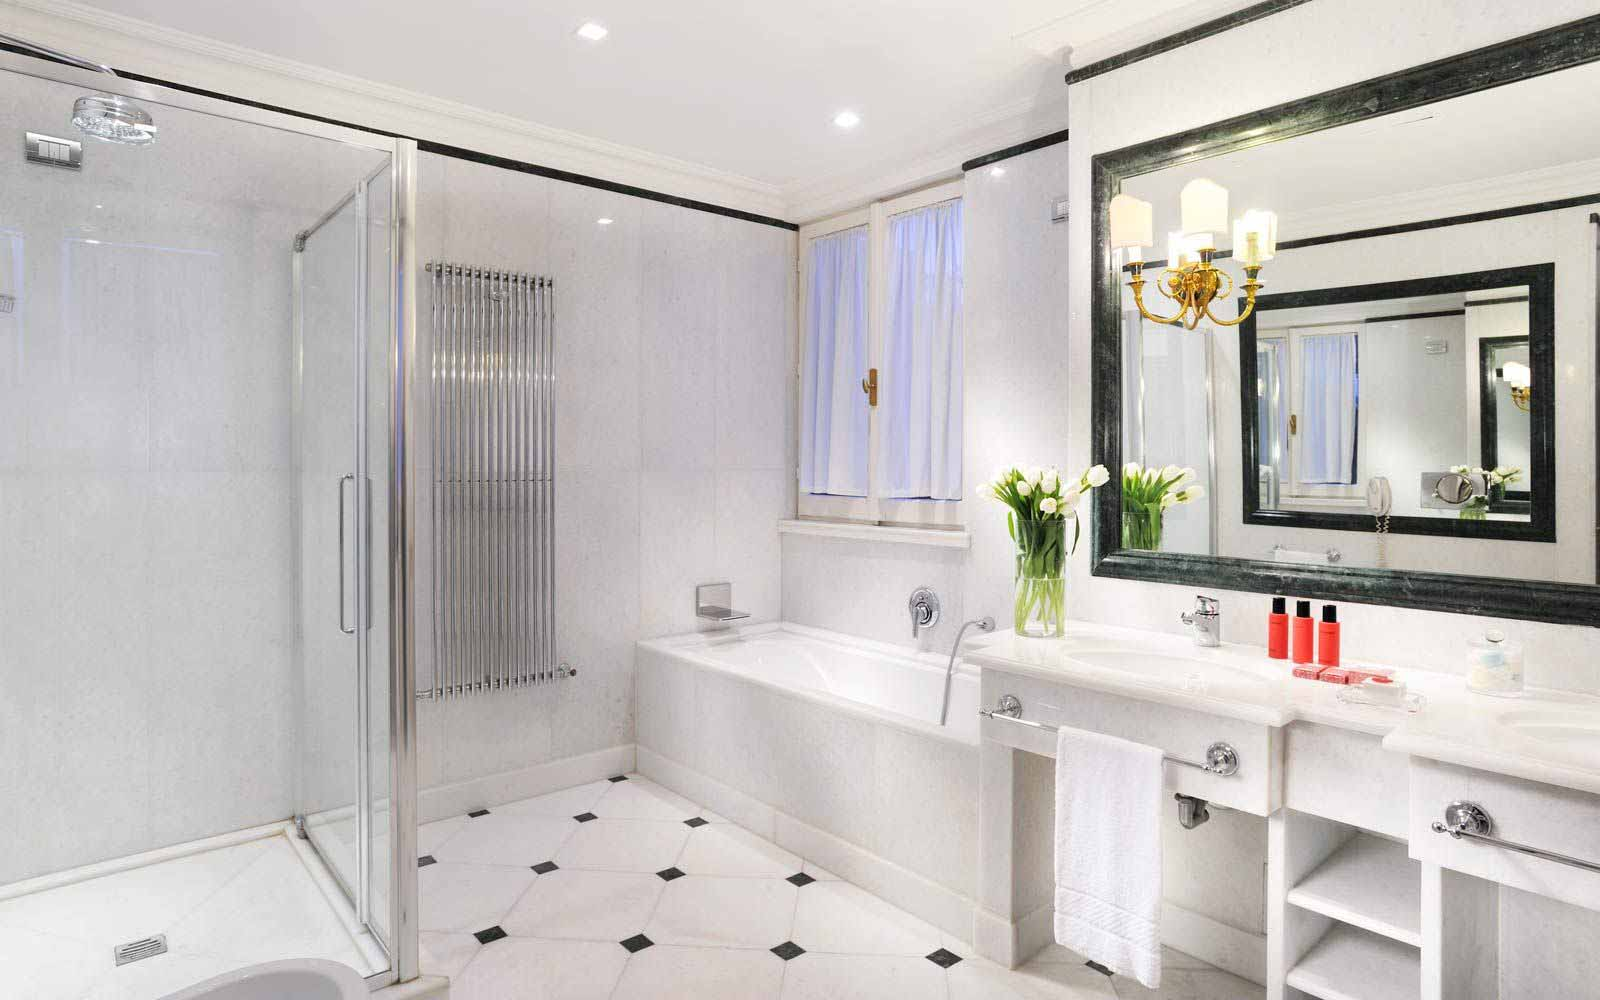 Bathroom at Hotel D'Inghilterra